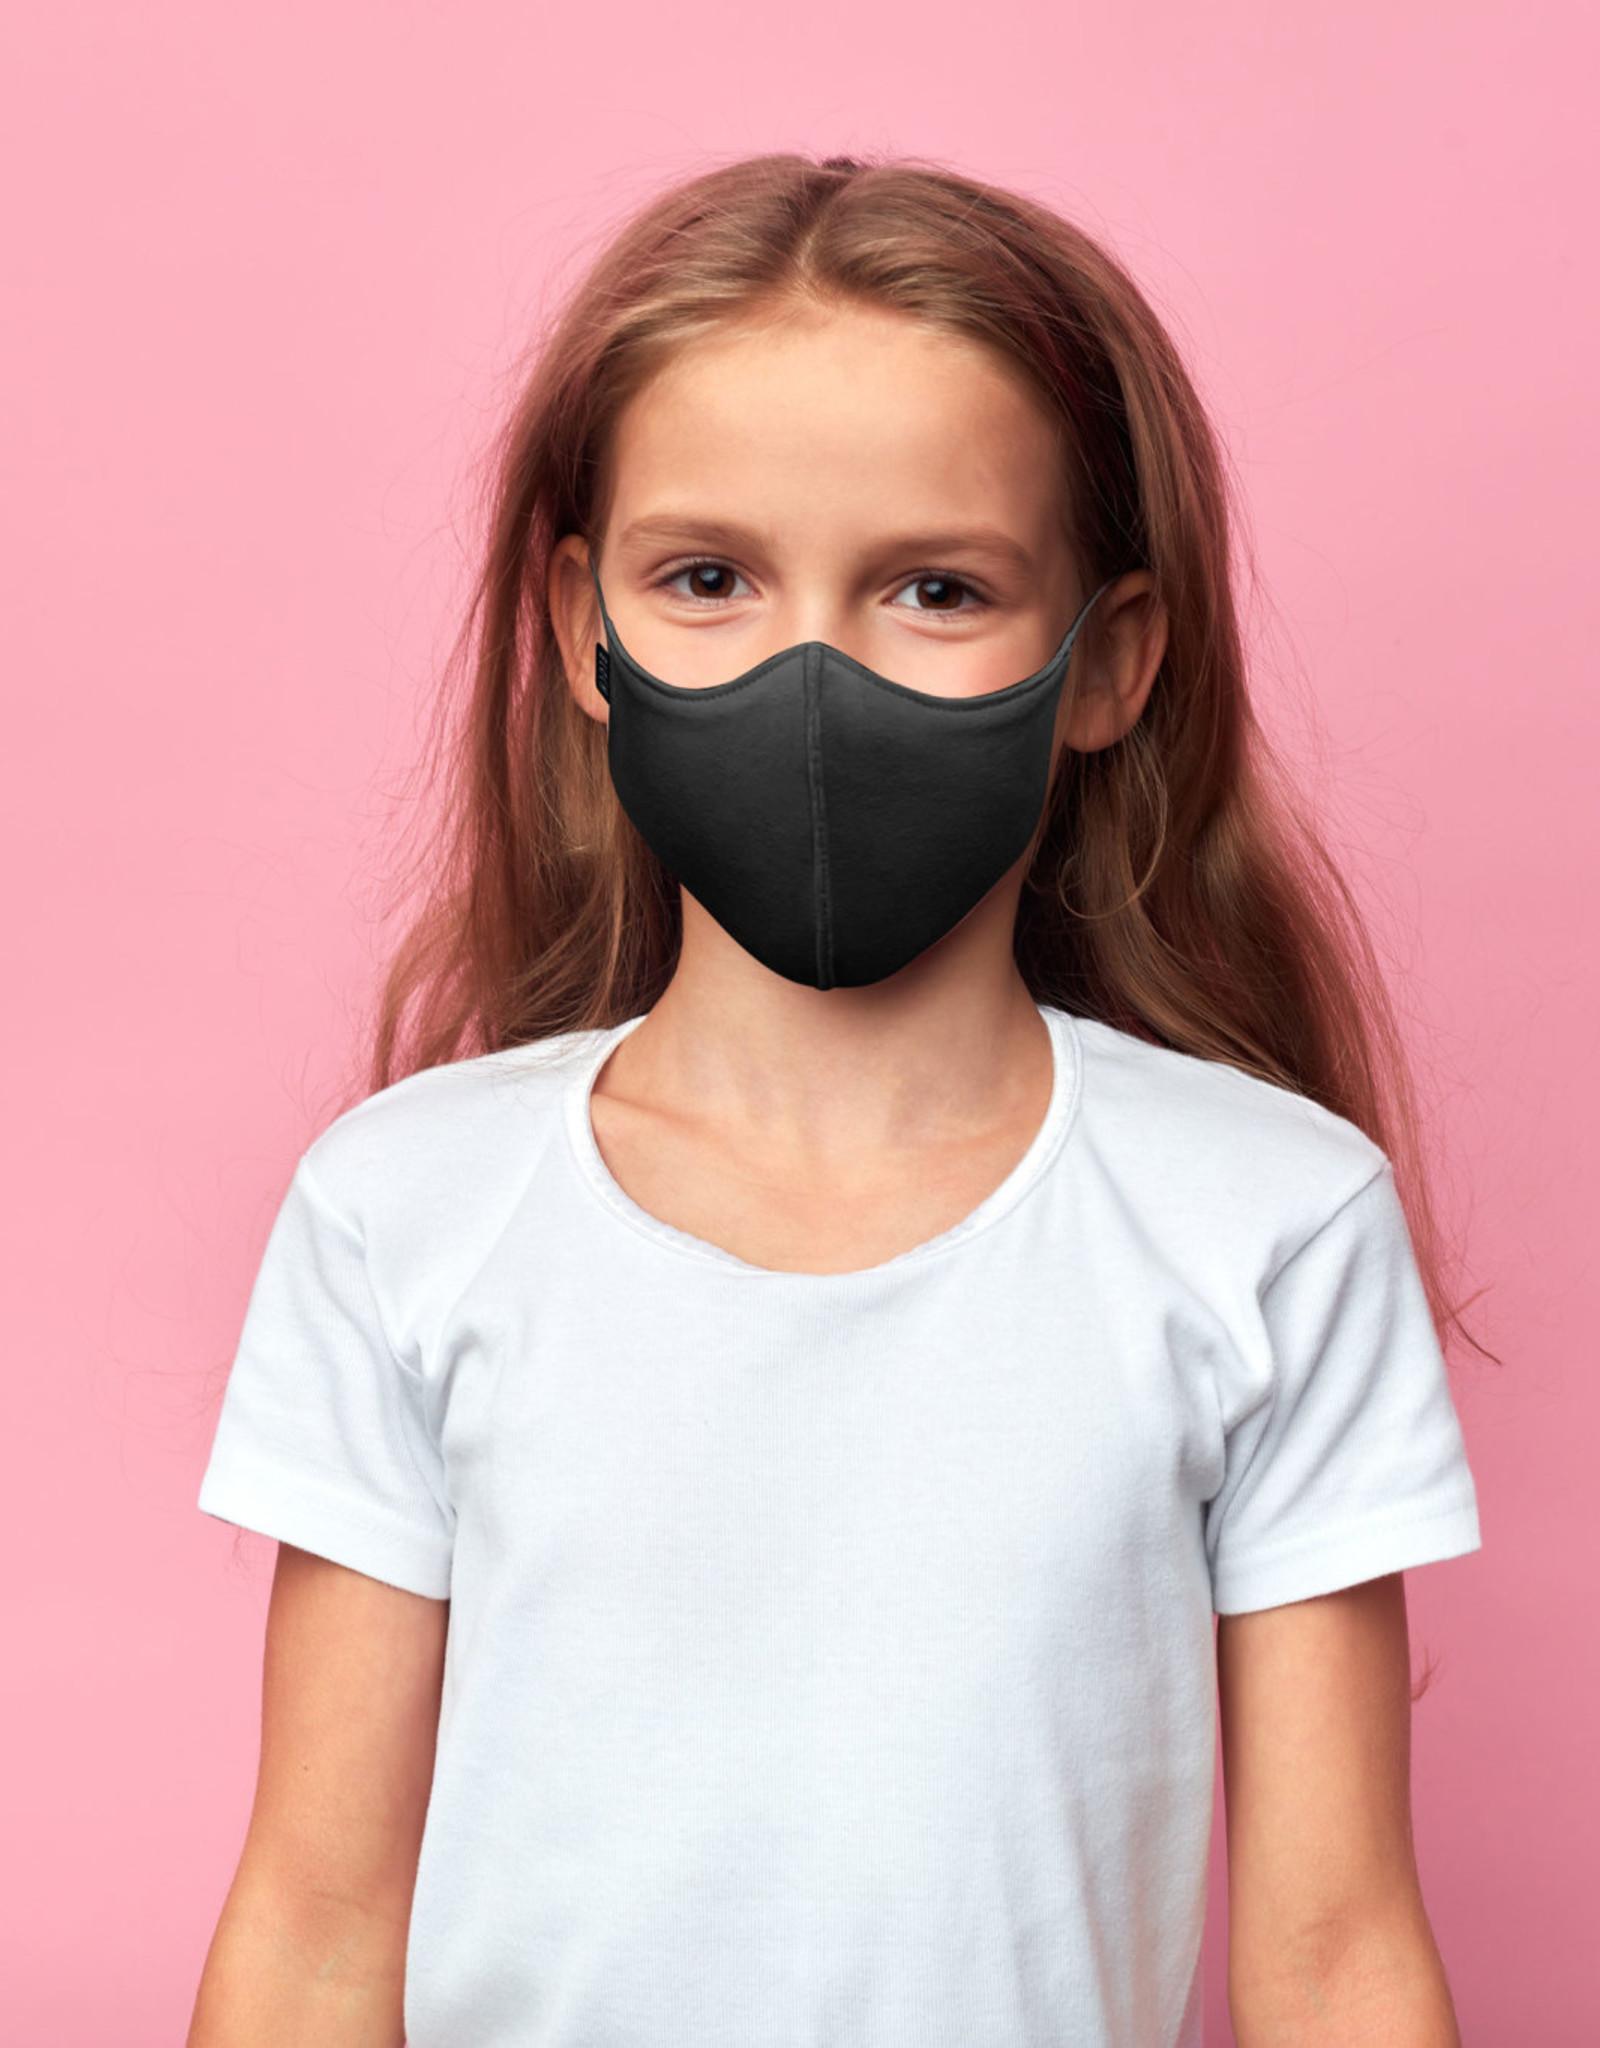 Bloch A001C Child Mask